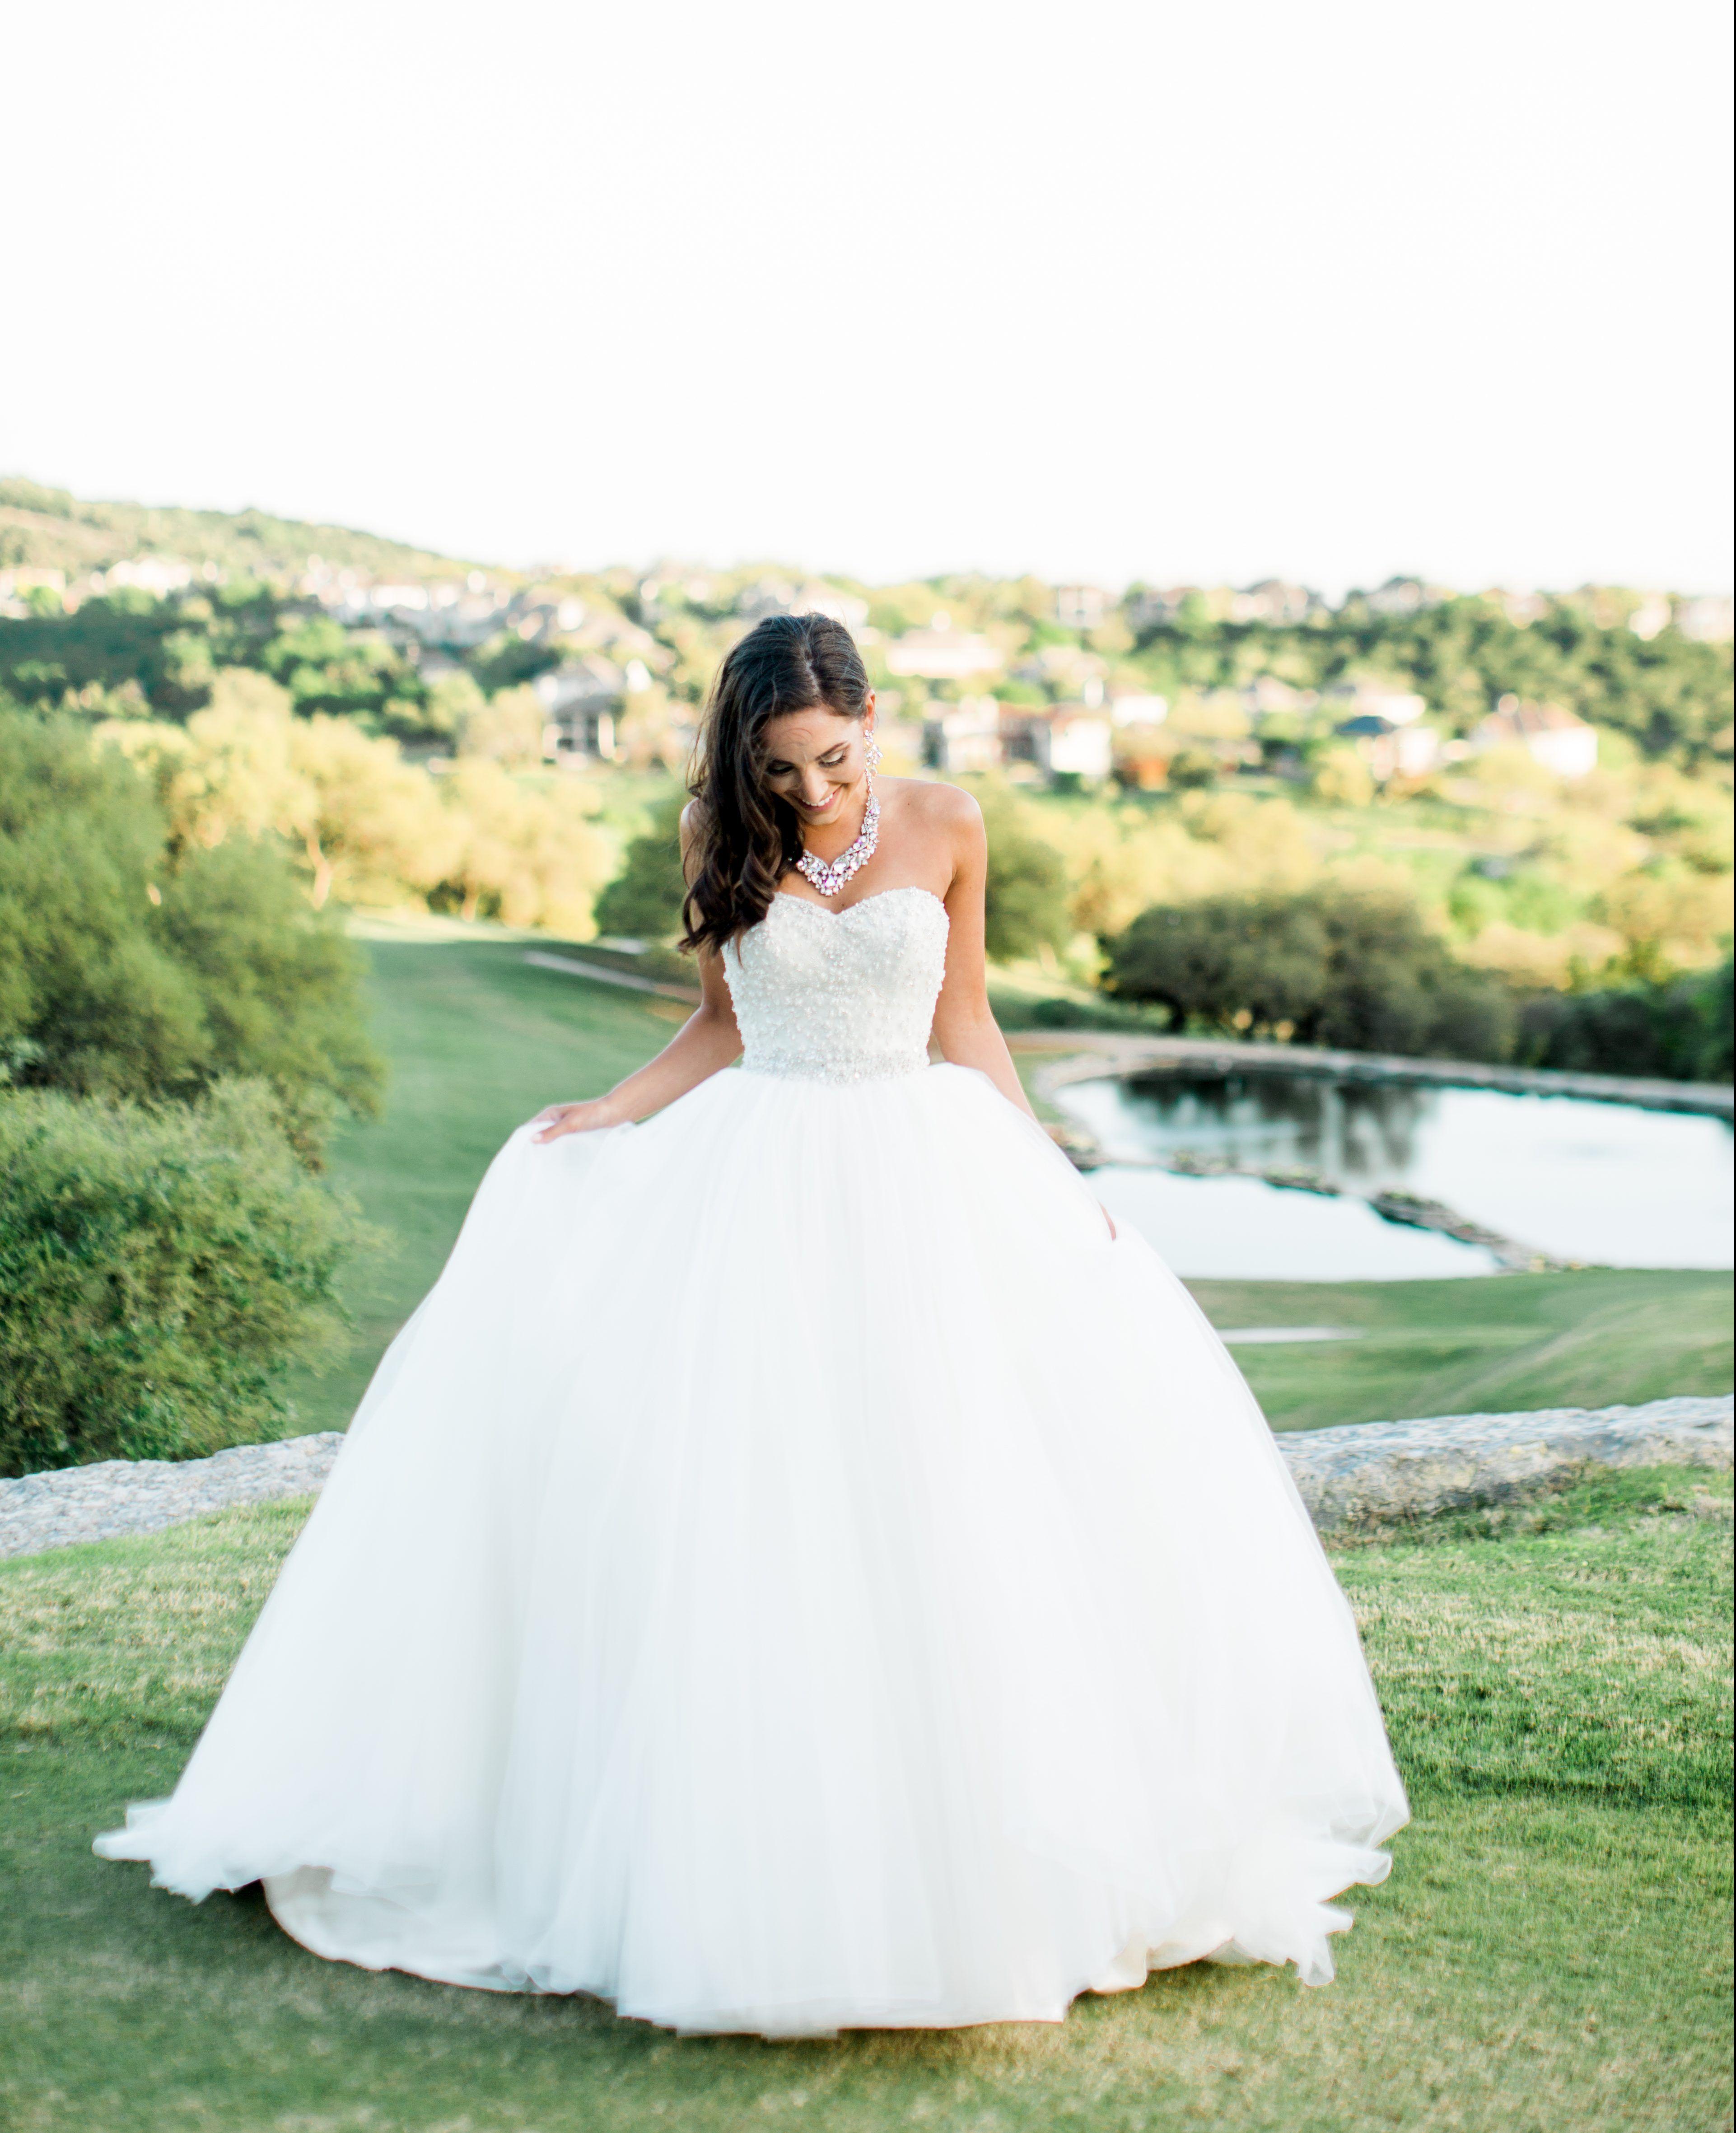 Brides in Austin, TX Justin alexander bridal, Wedding